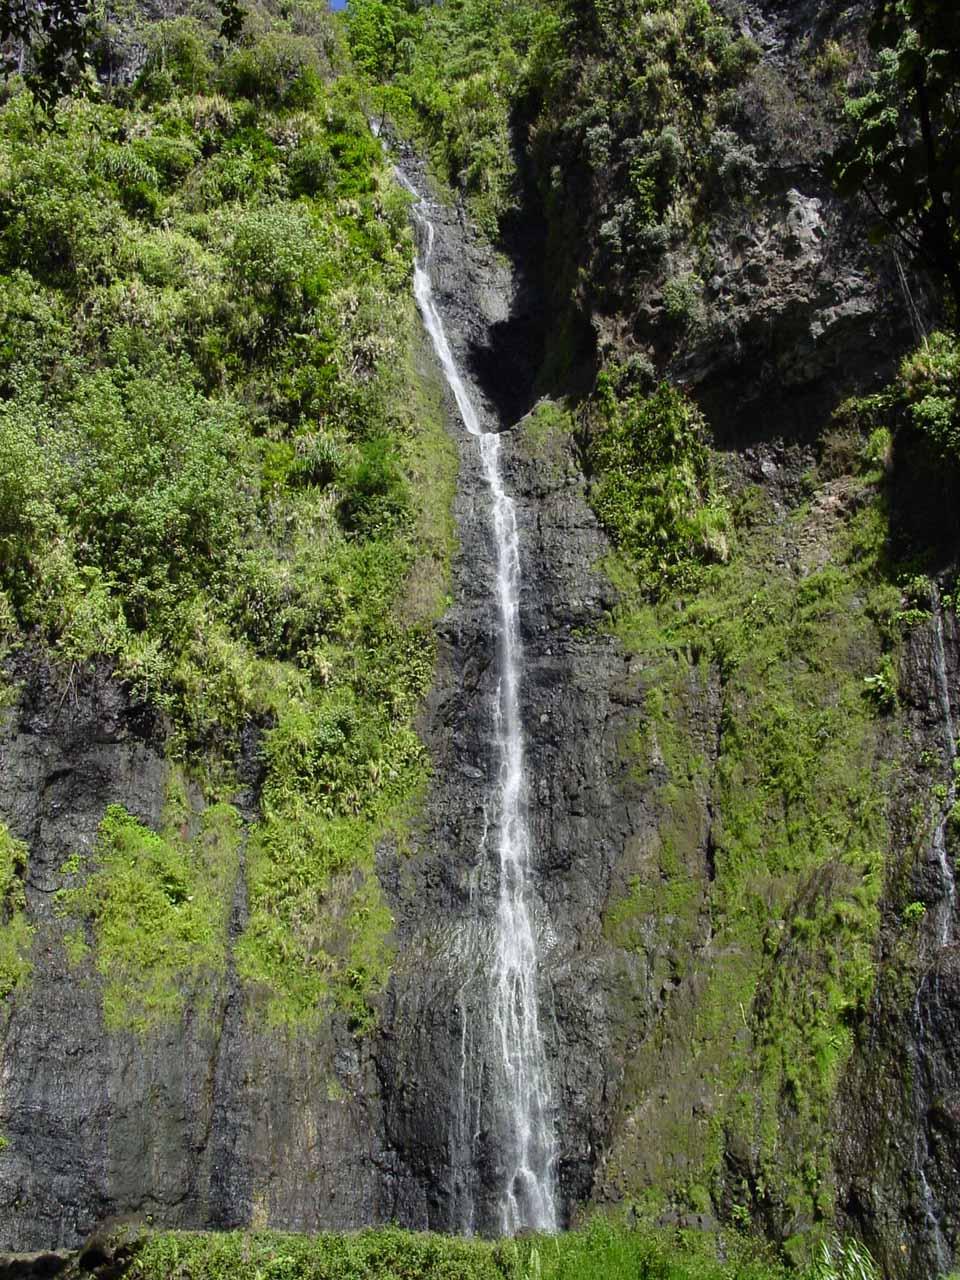 Vaimahutu Waterfall on Tahiti Island in September 2002